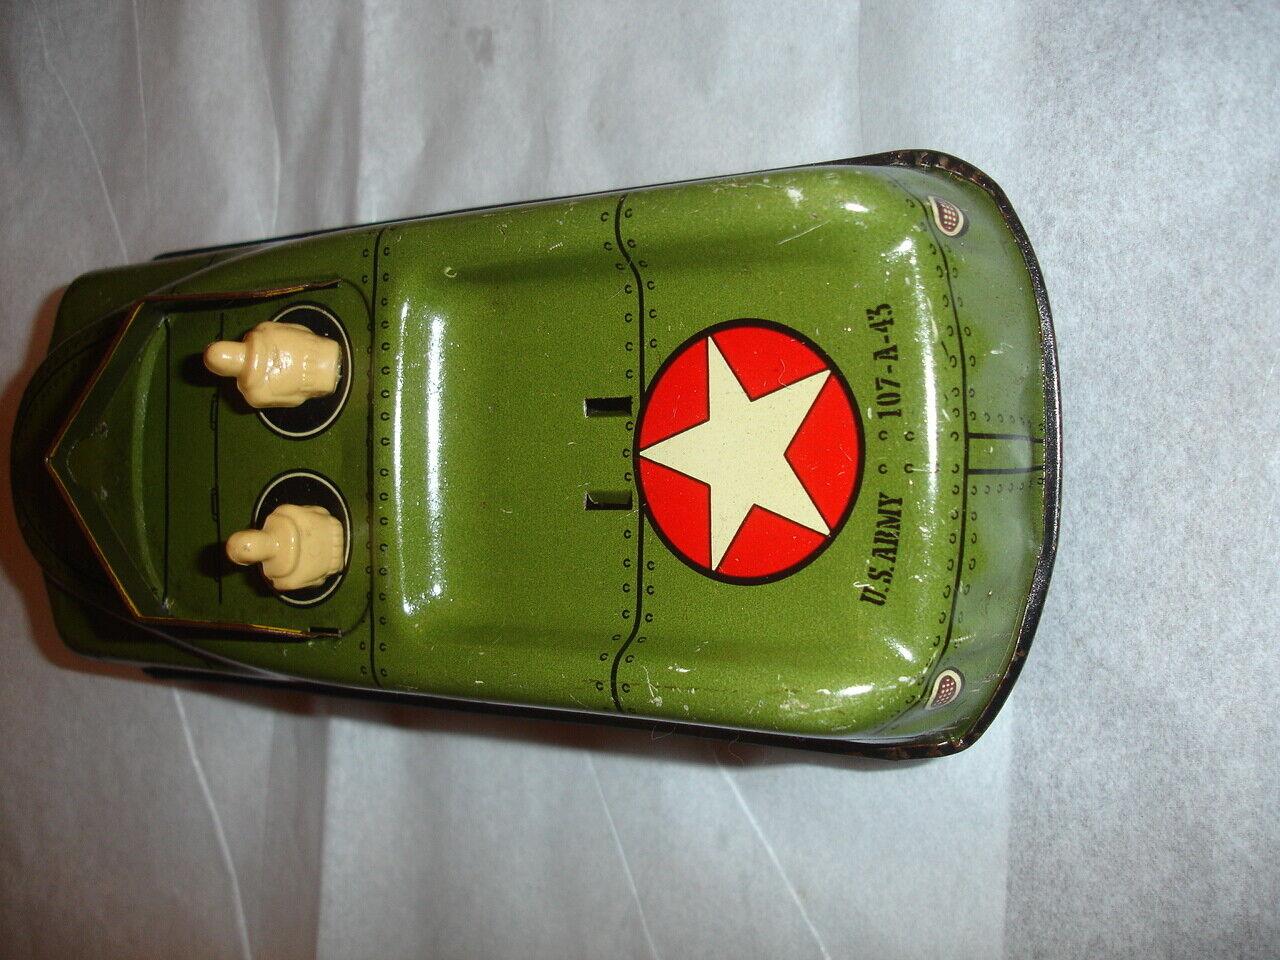 TX ESTATE VTG Courtland 40s 50s Tin Litho US Army Vehicle Friction Toy Car 7